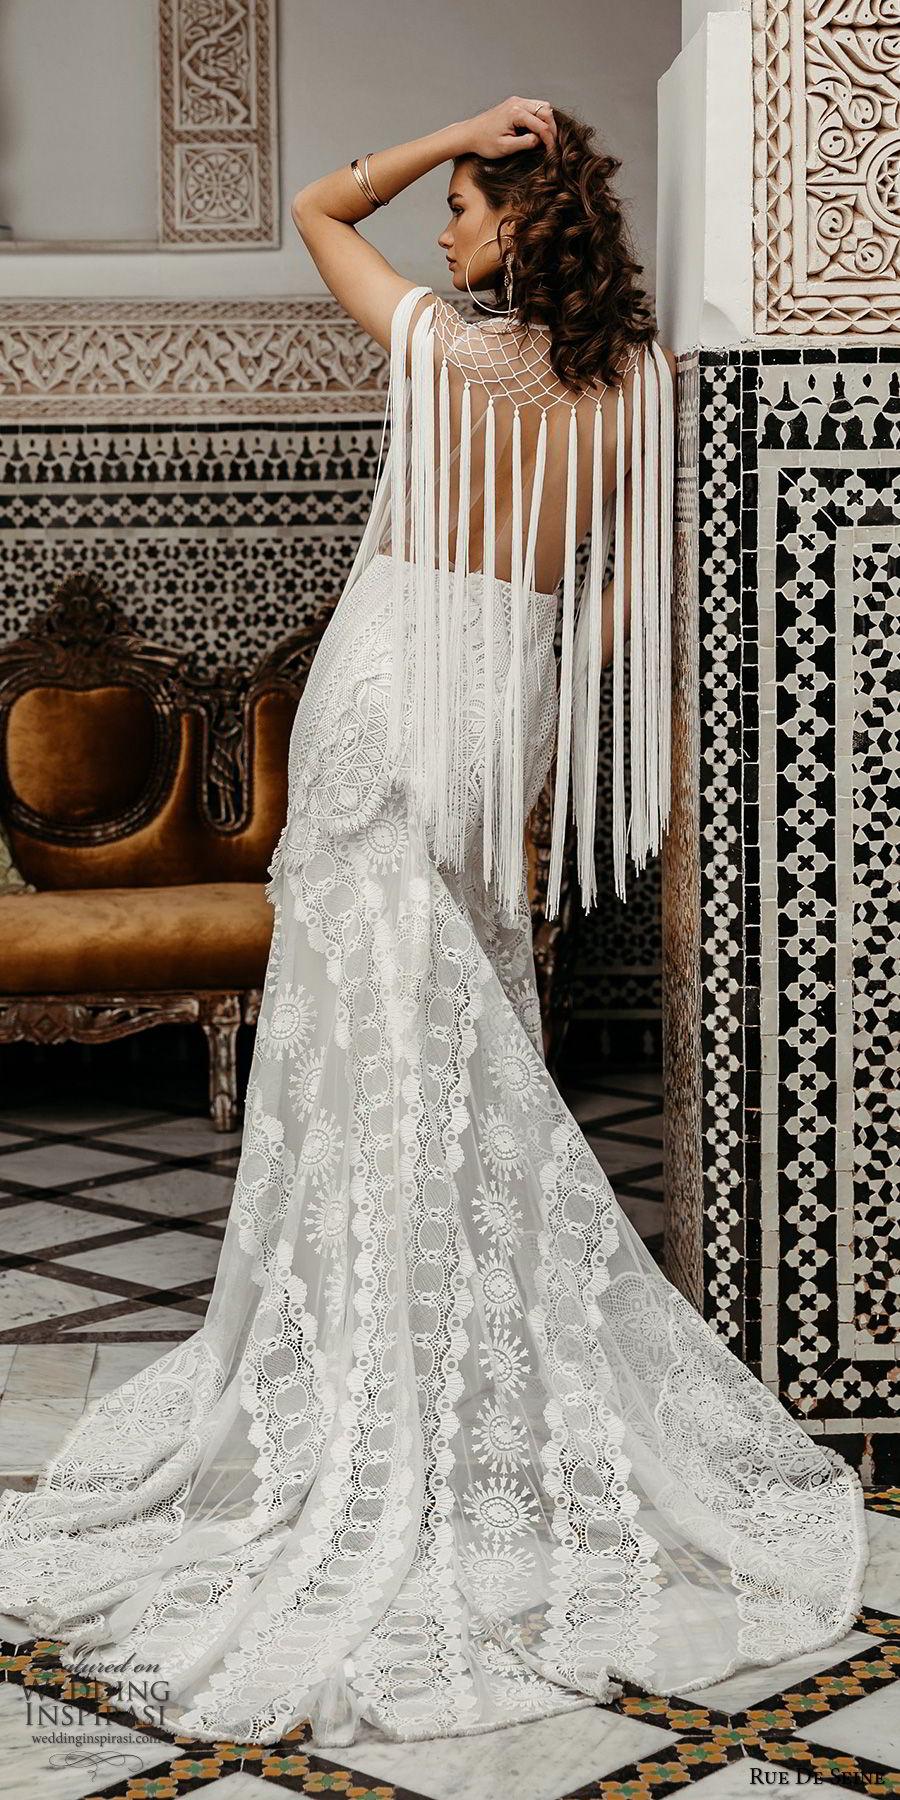 rue de seine 2019 bridal sleeveless illusion straps plunging v neckline embellished lace modified a line wedding dress (12) boho chic romantic open back chapel train bv